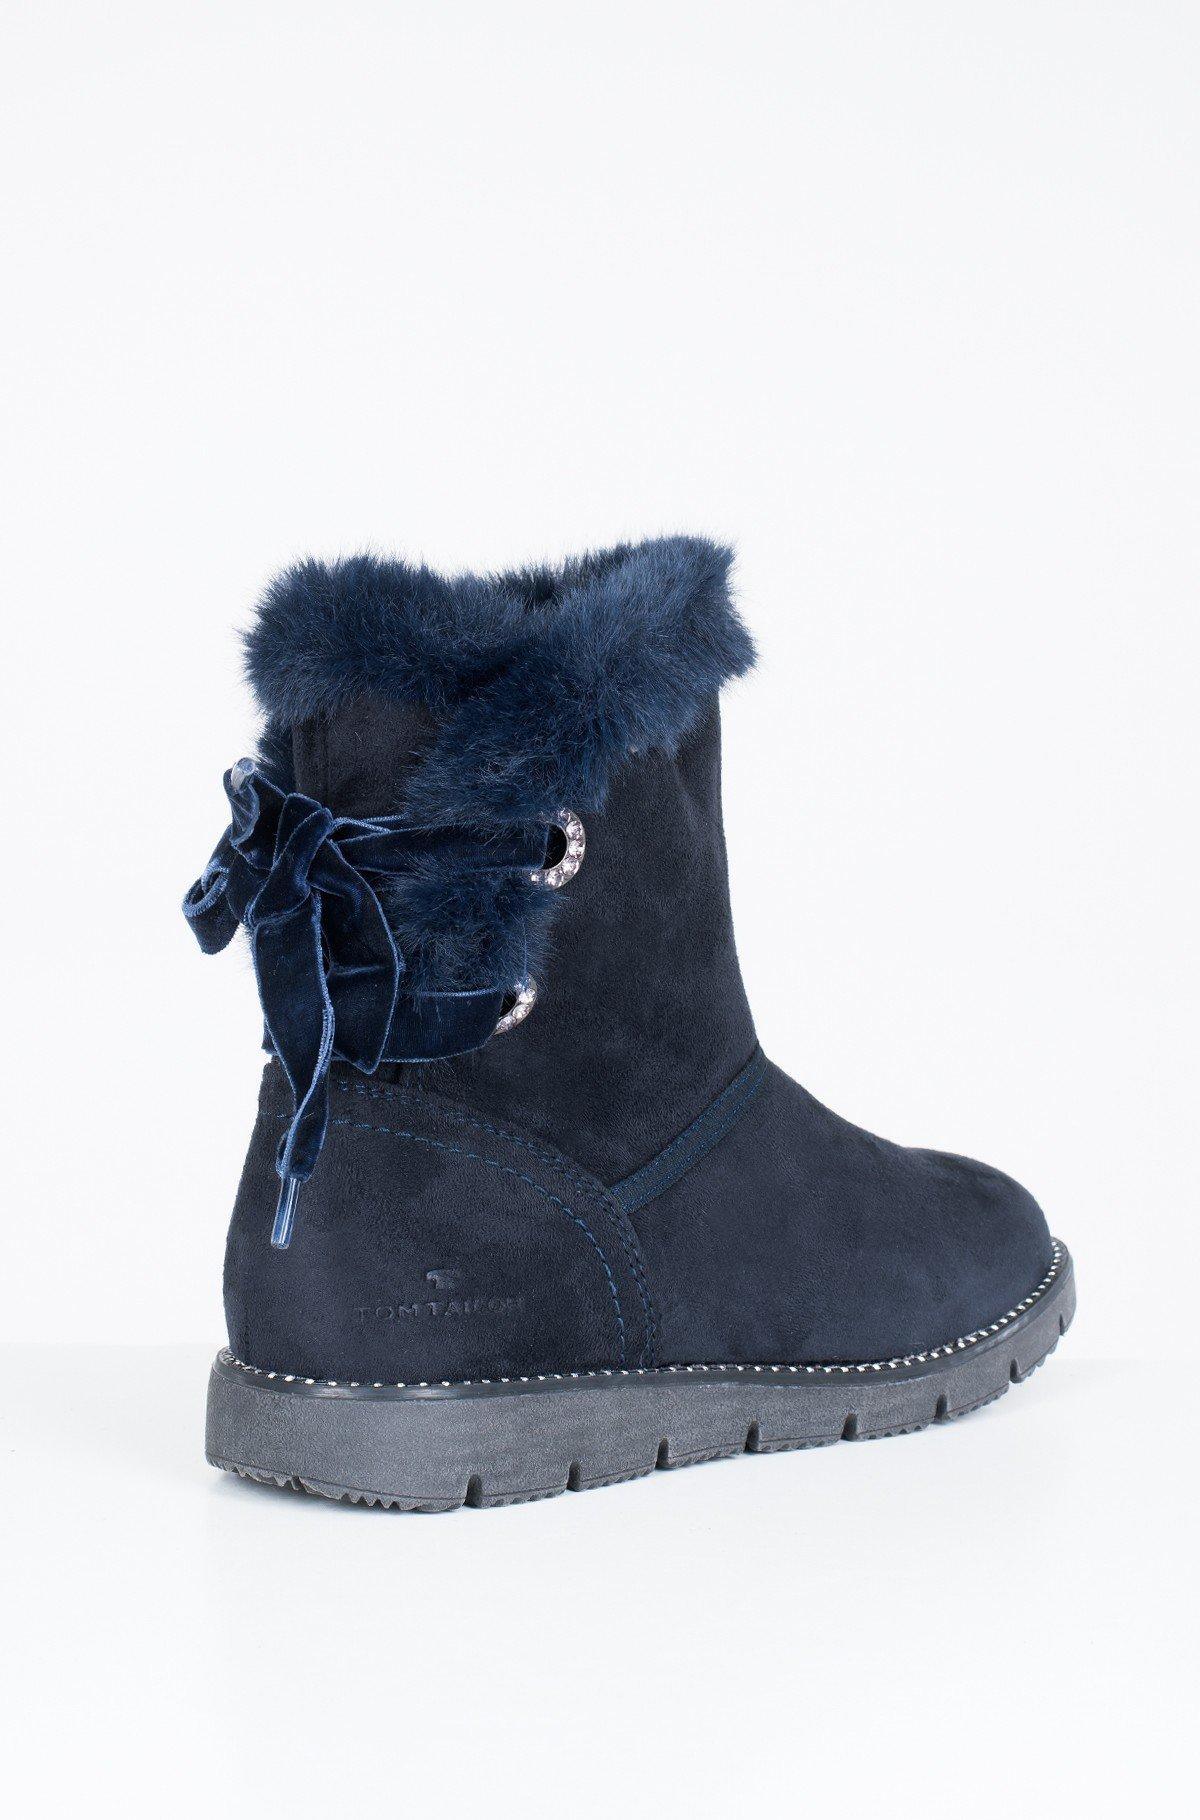 Boots 7993110-full-2